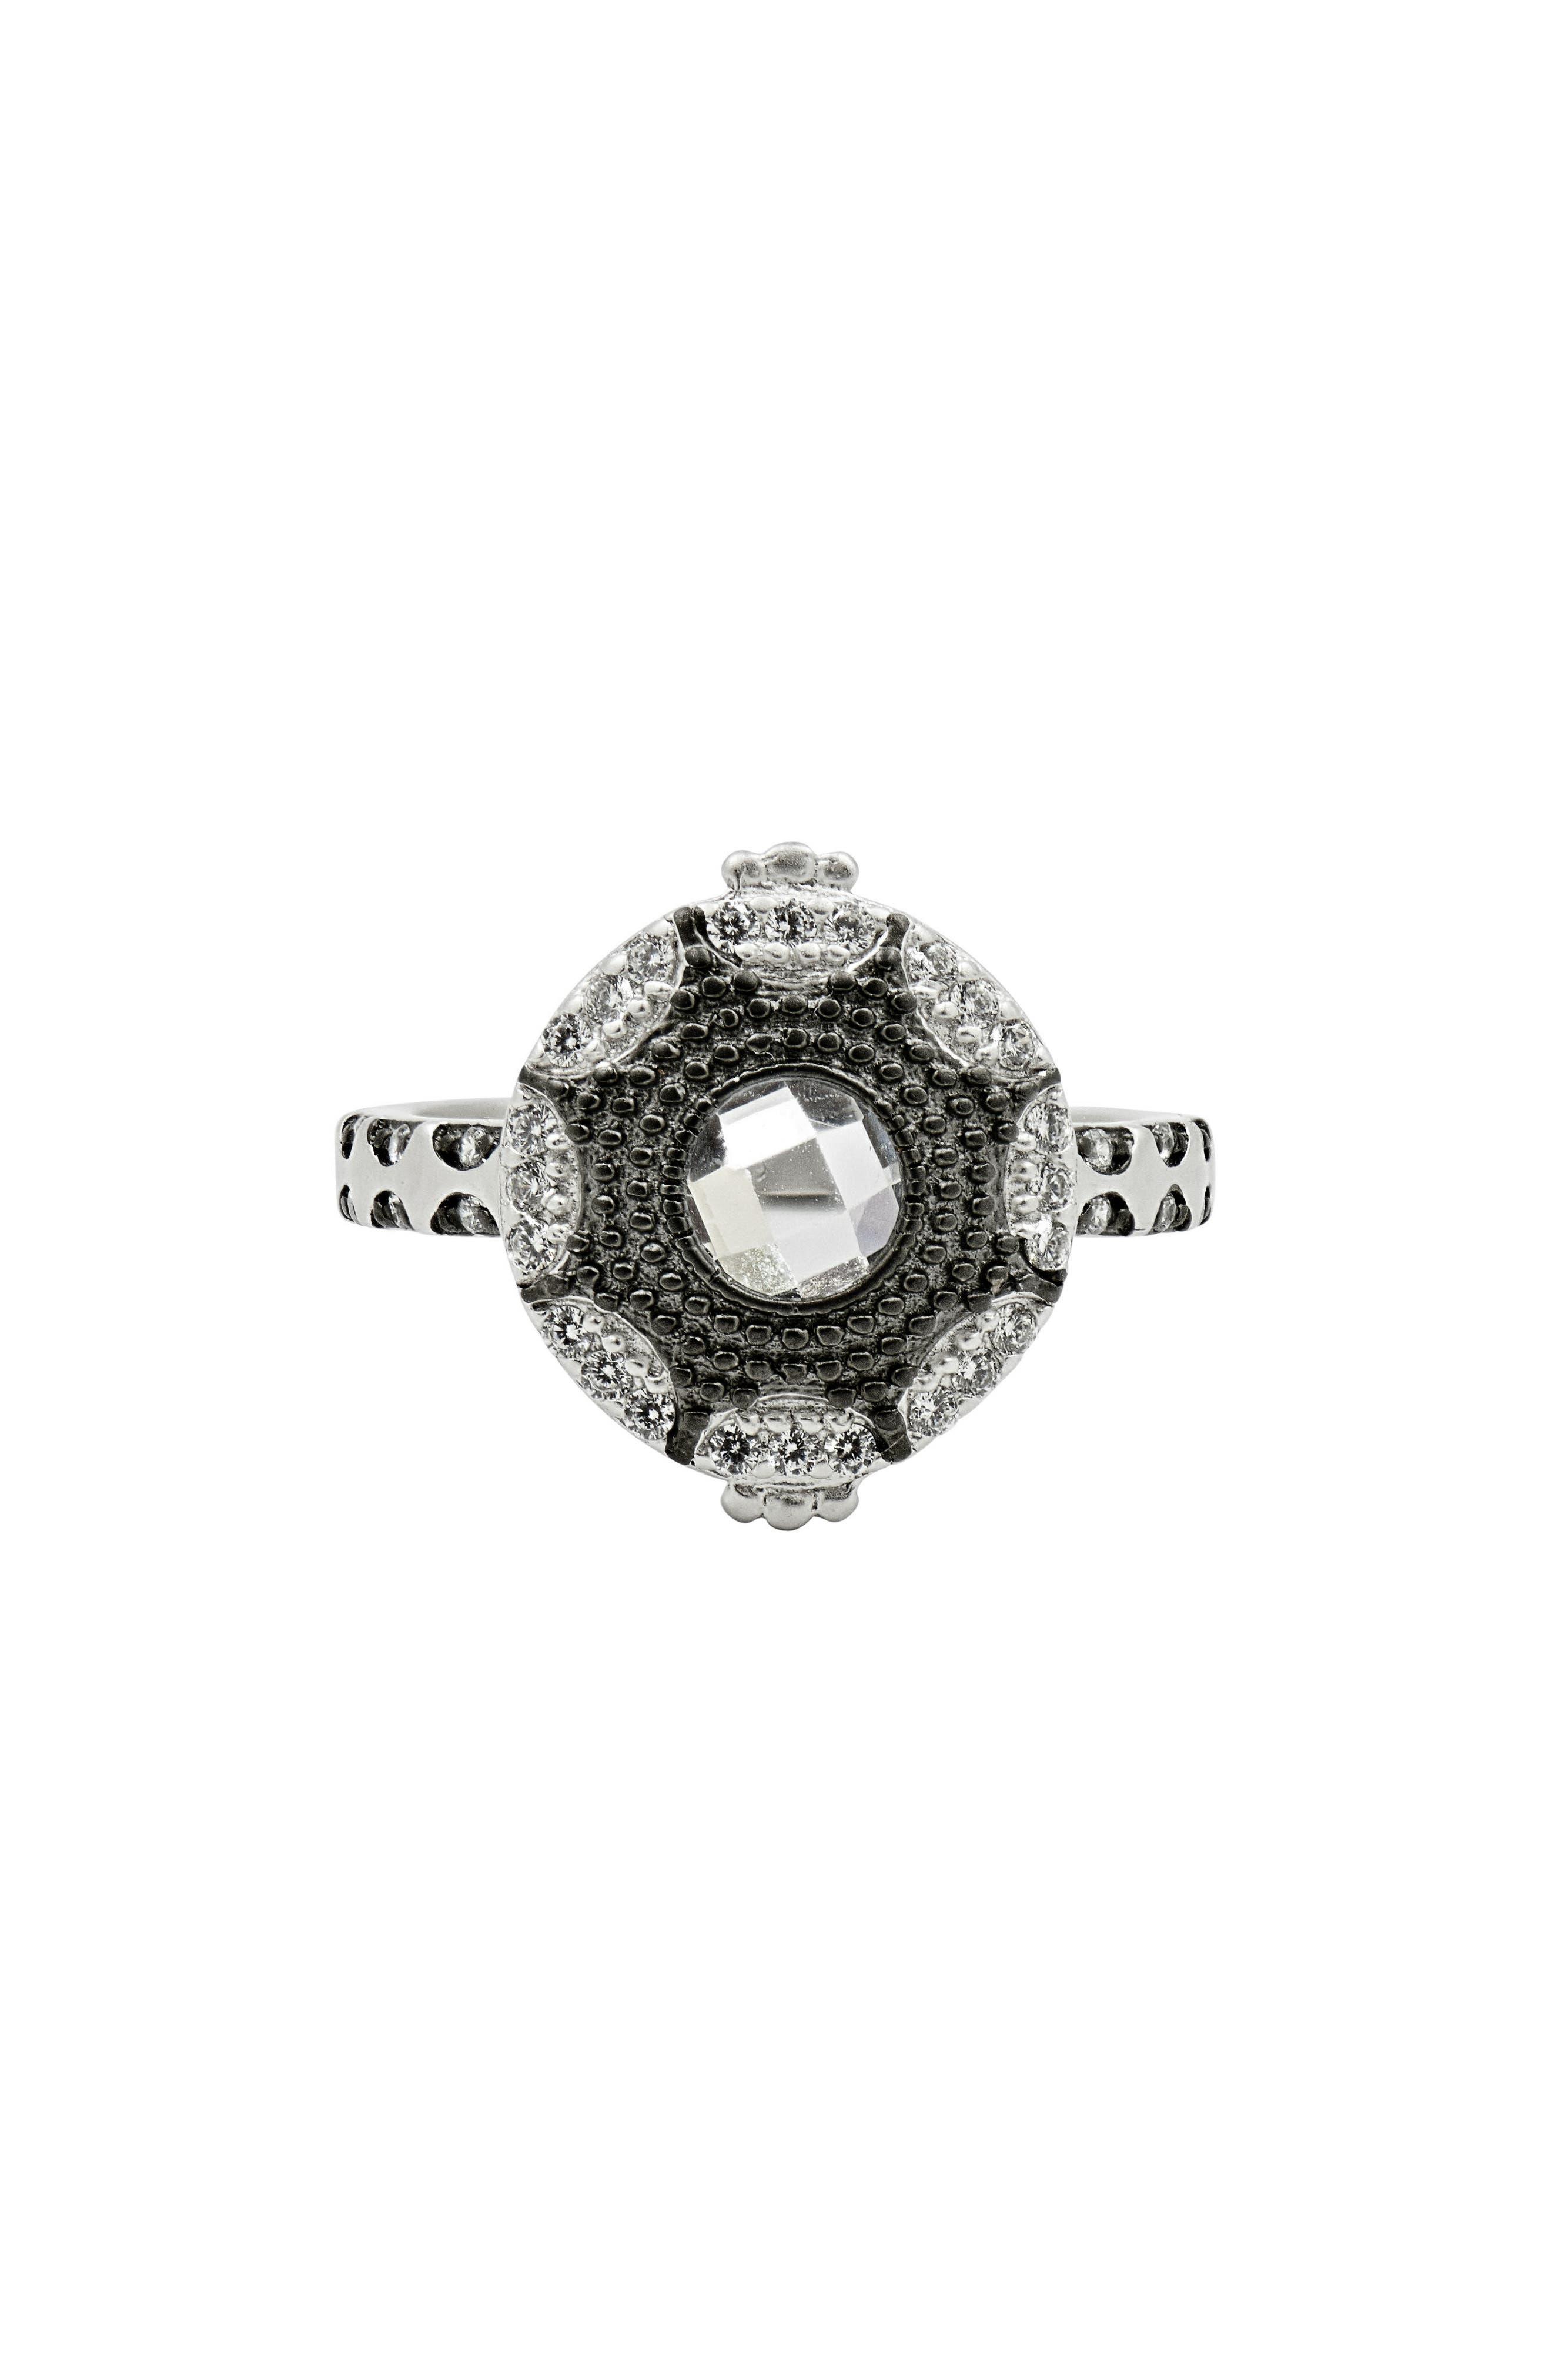 Main Image - FREIDA ROTHMAN Signature Starburst Ring